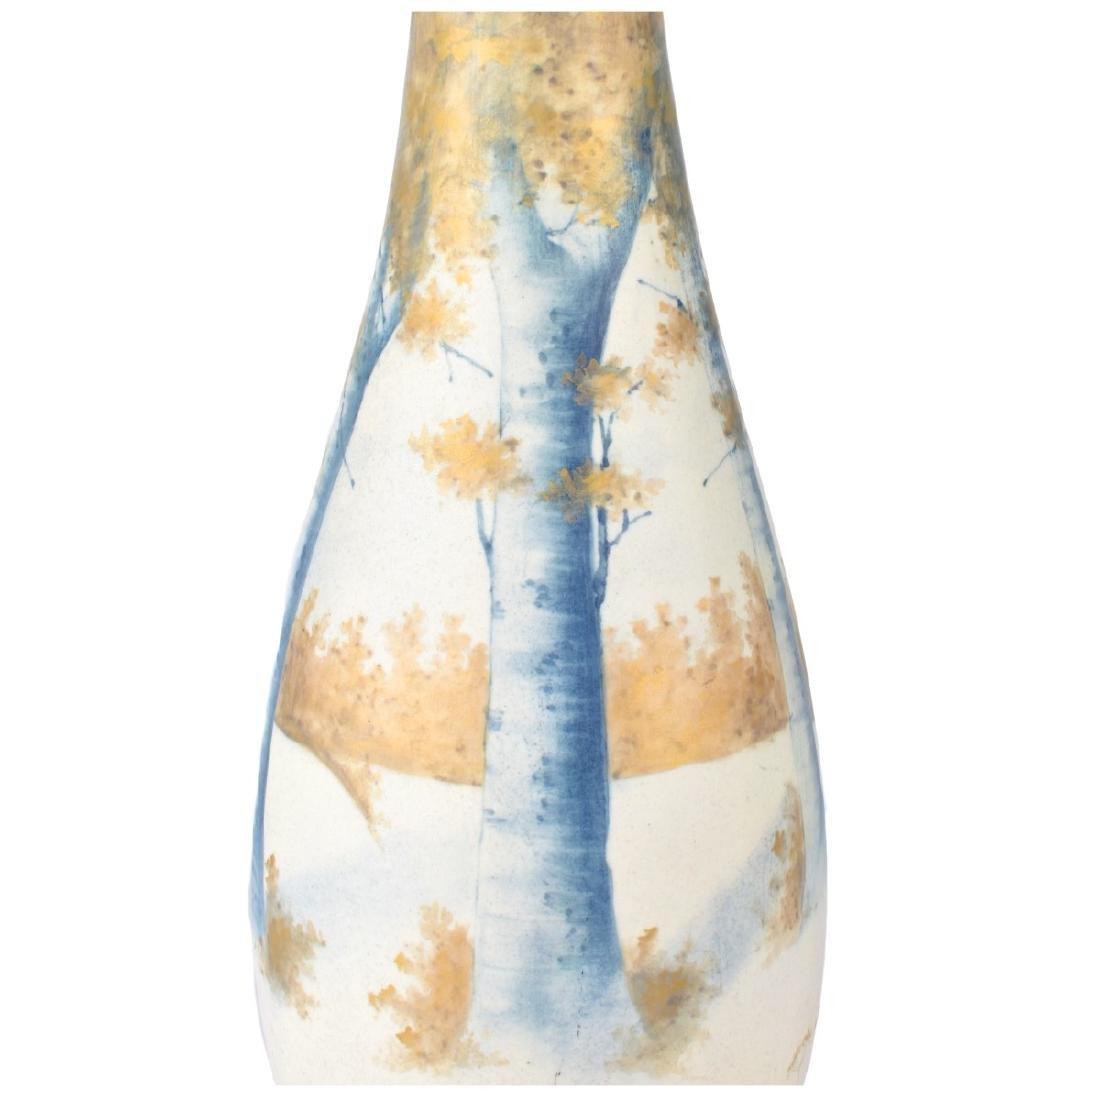 Paul Daschel Turn Teplitz Porcelain Vase - 4